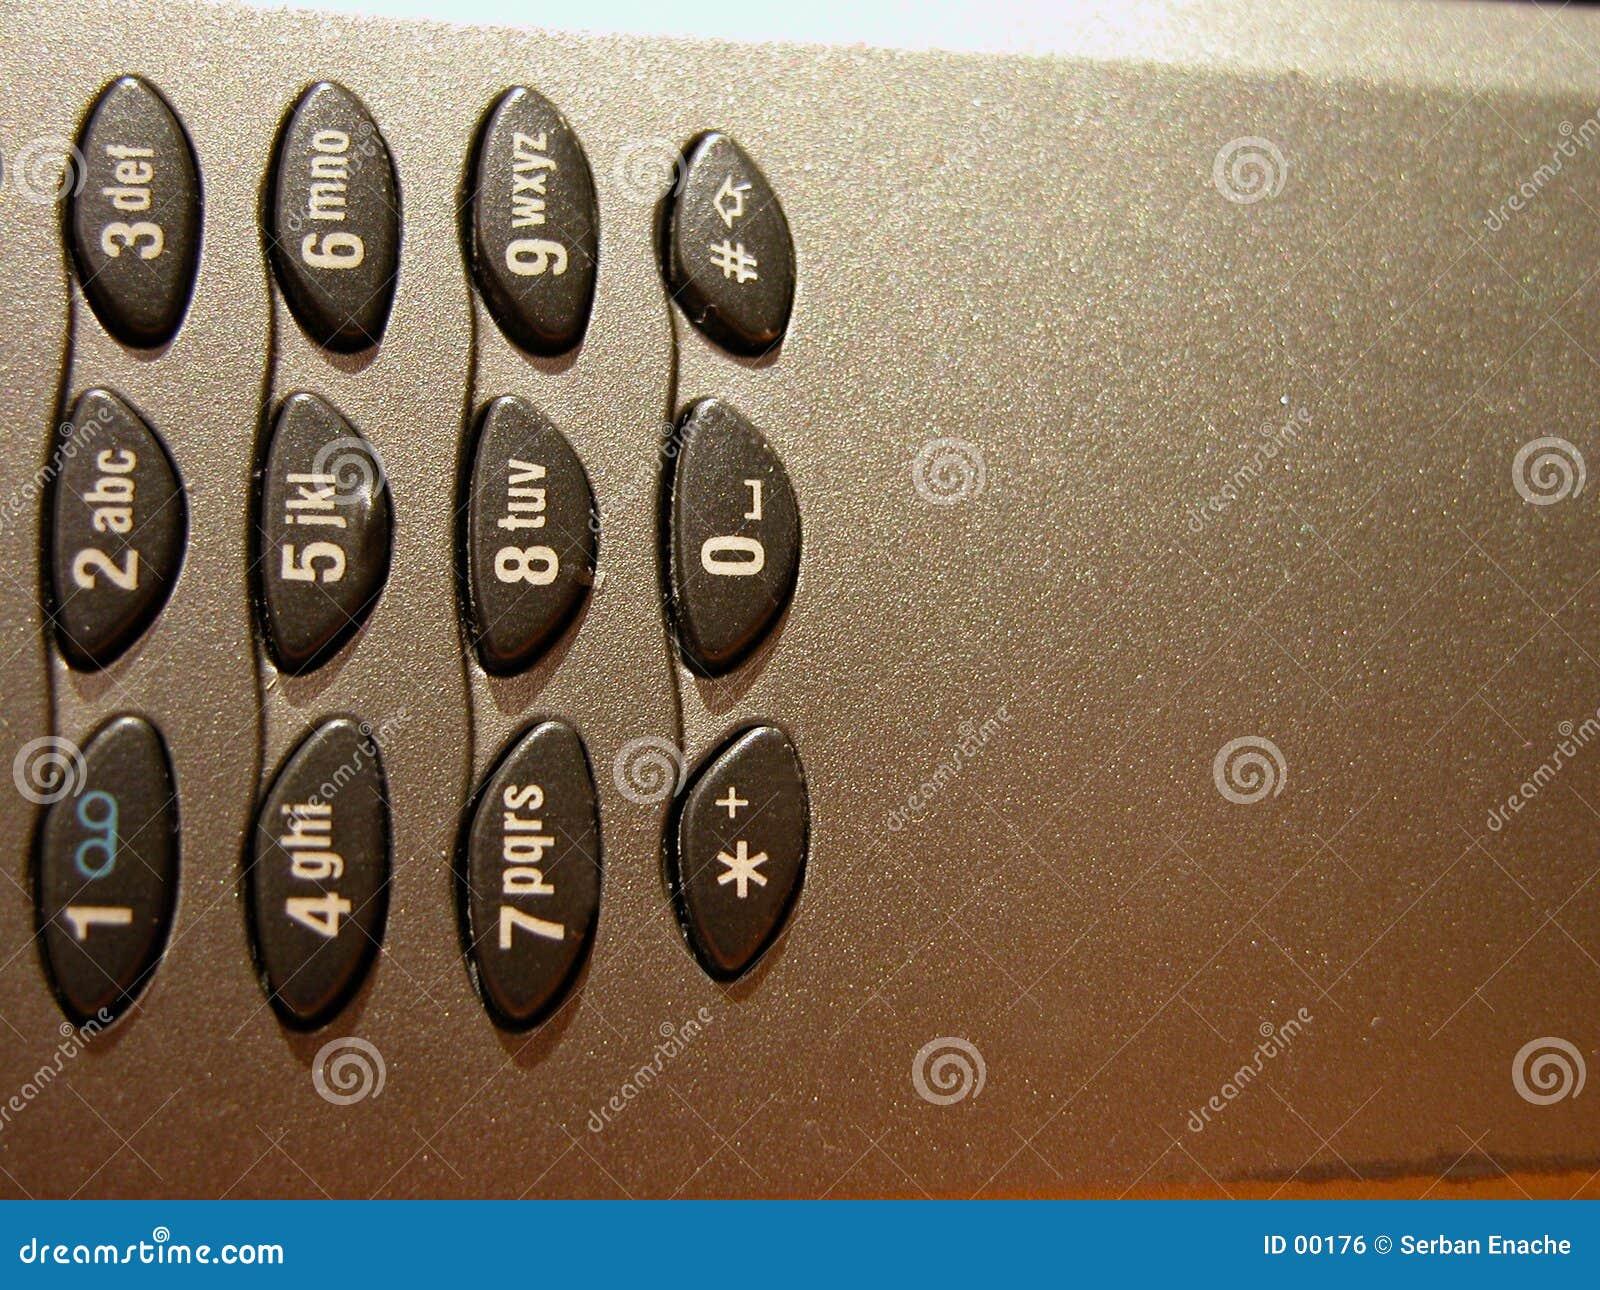 Teléfono móvil - detalle 2